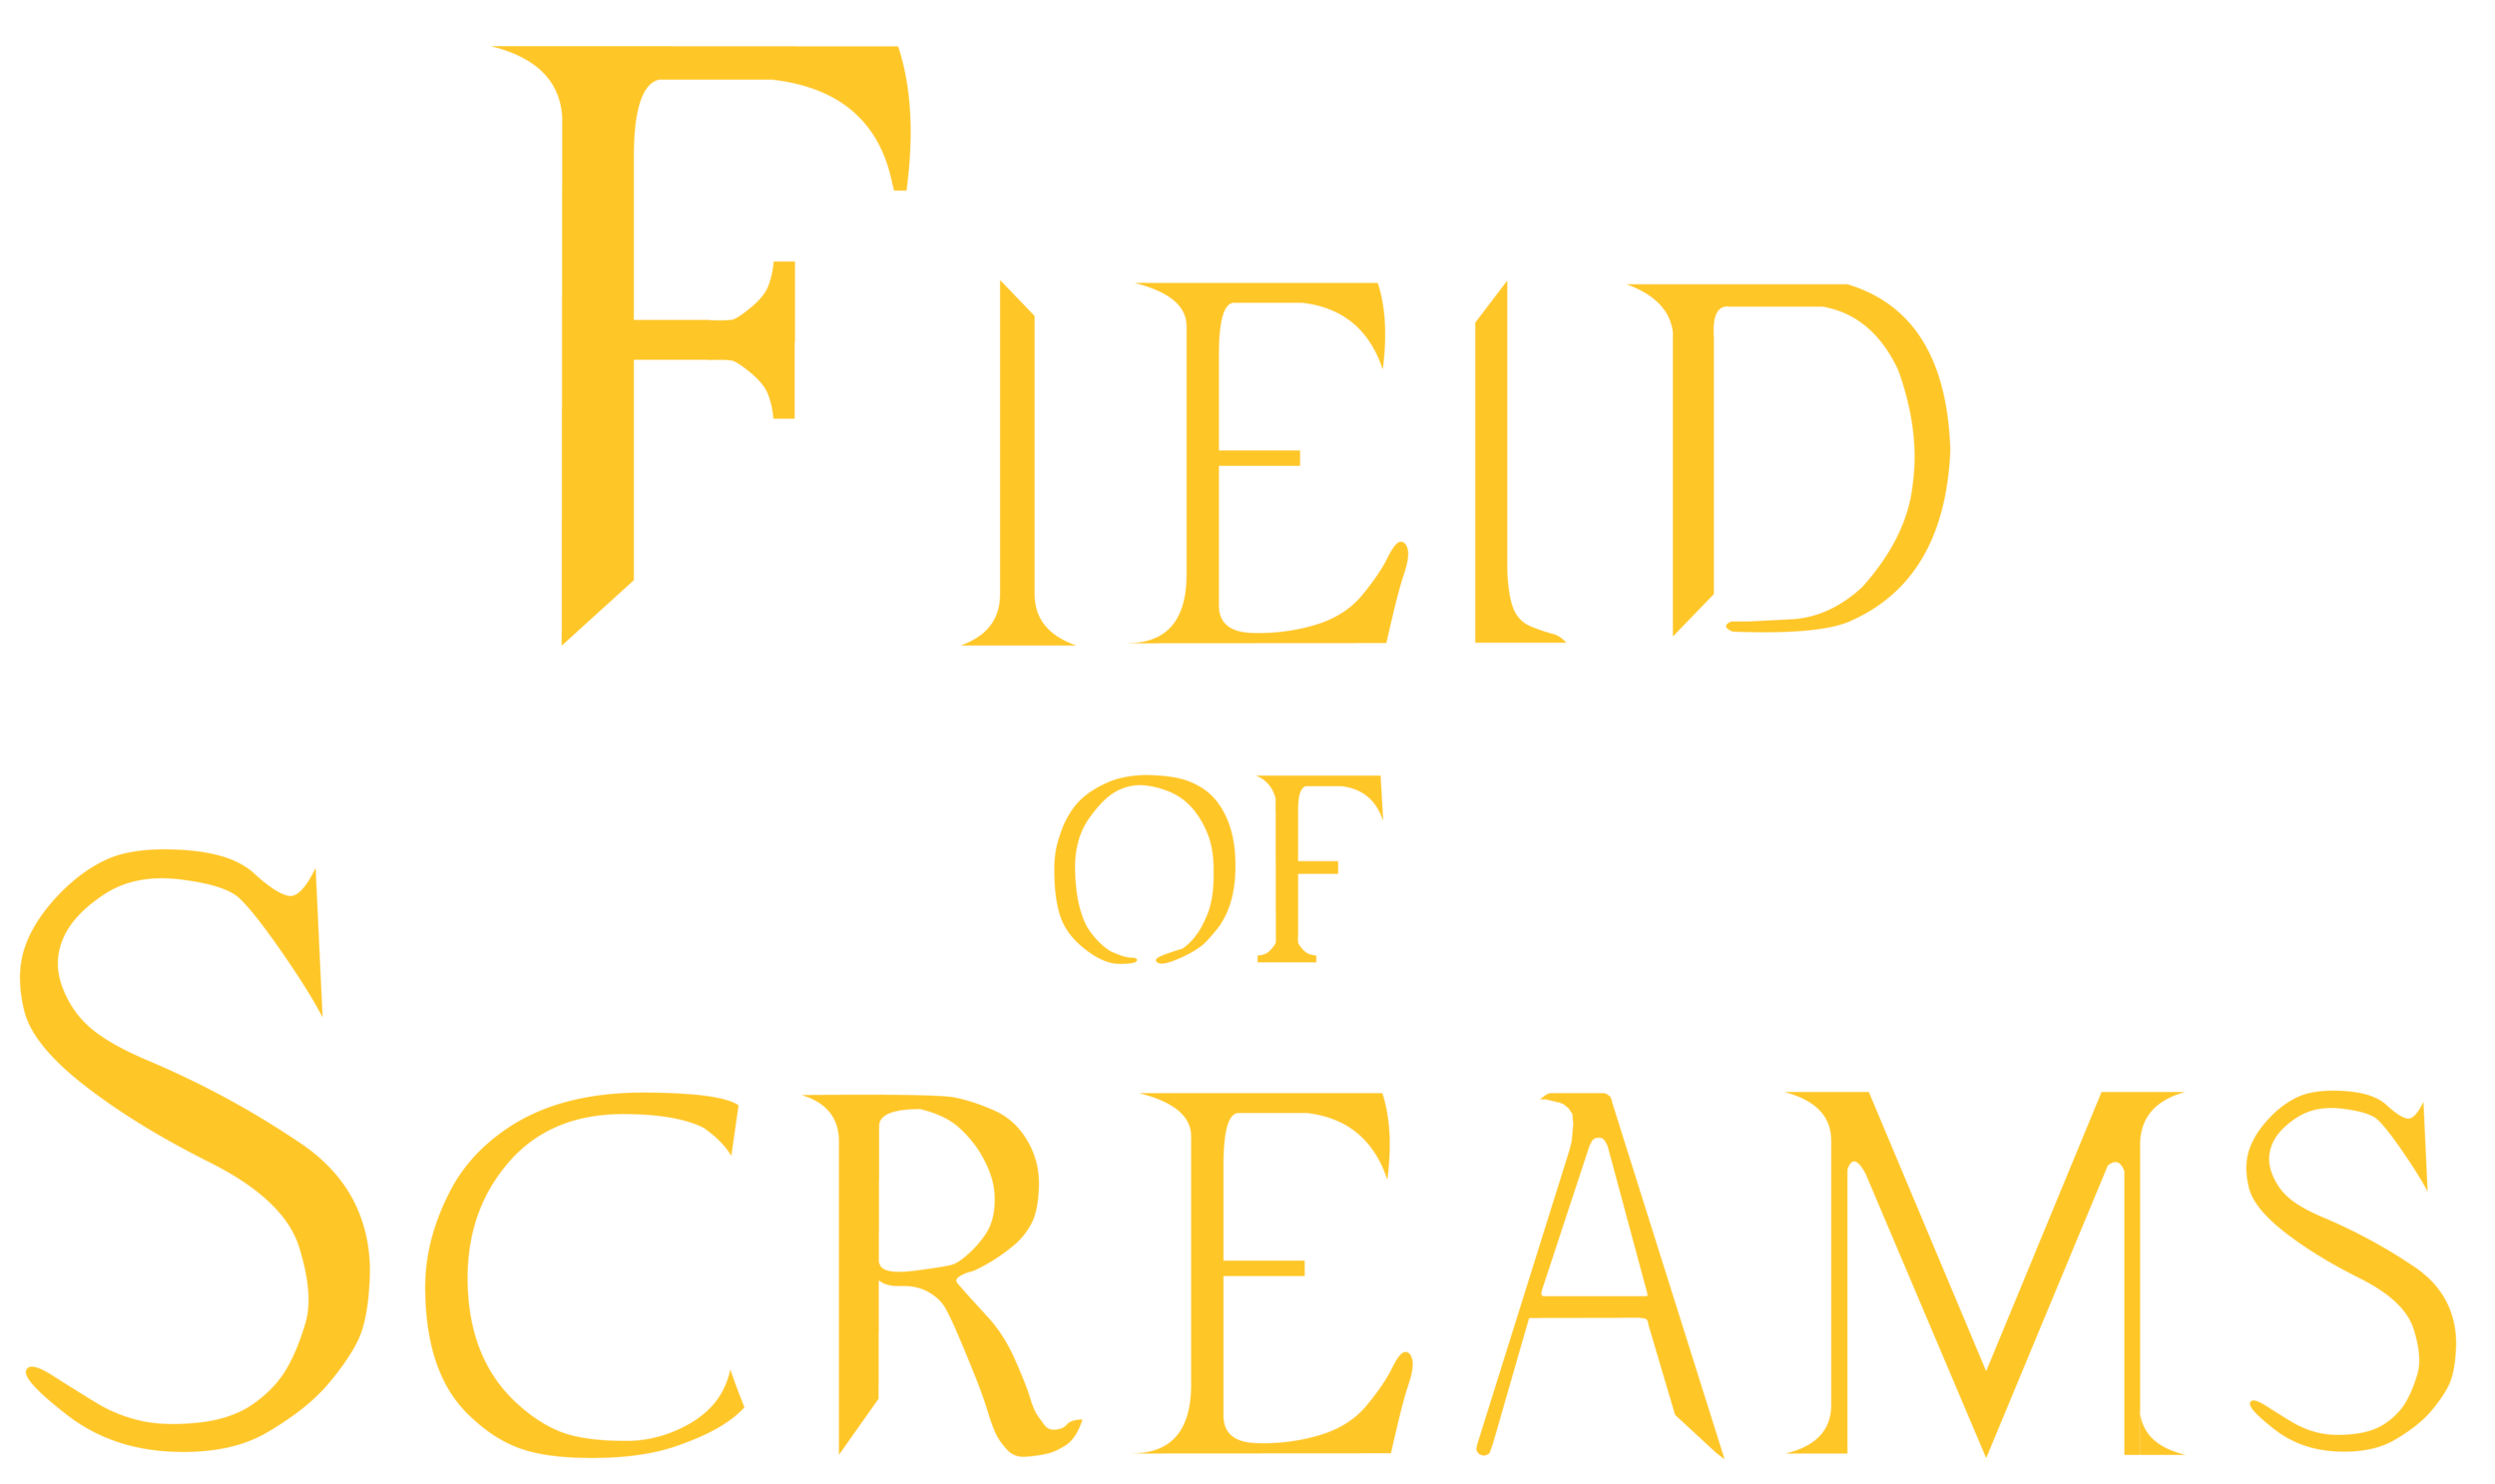 field of screams retro yellow.png